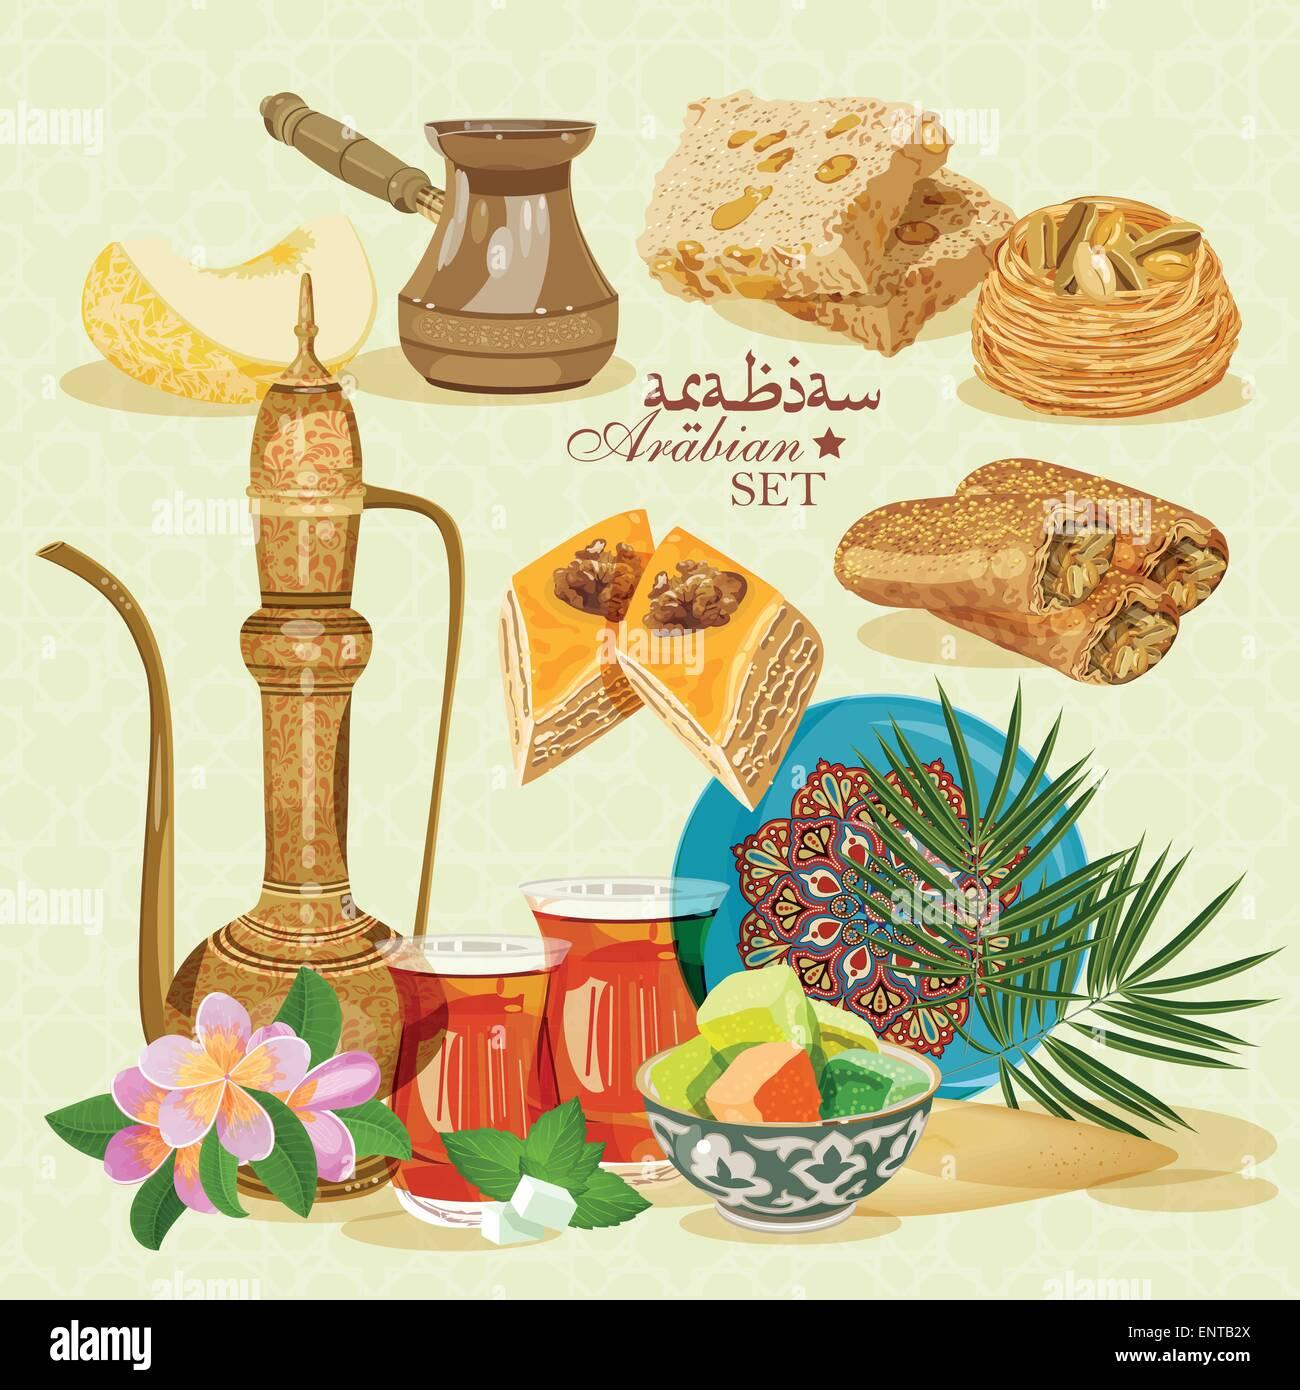 Arabic Food. Traditional eastern cuisine. - Stock Vector